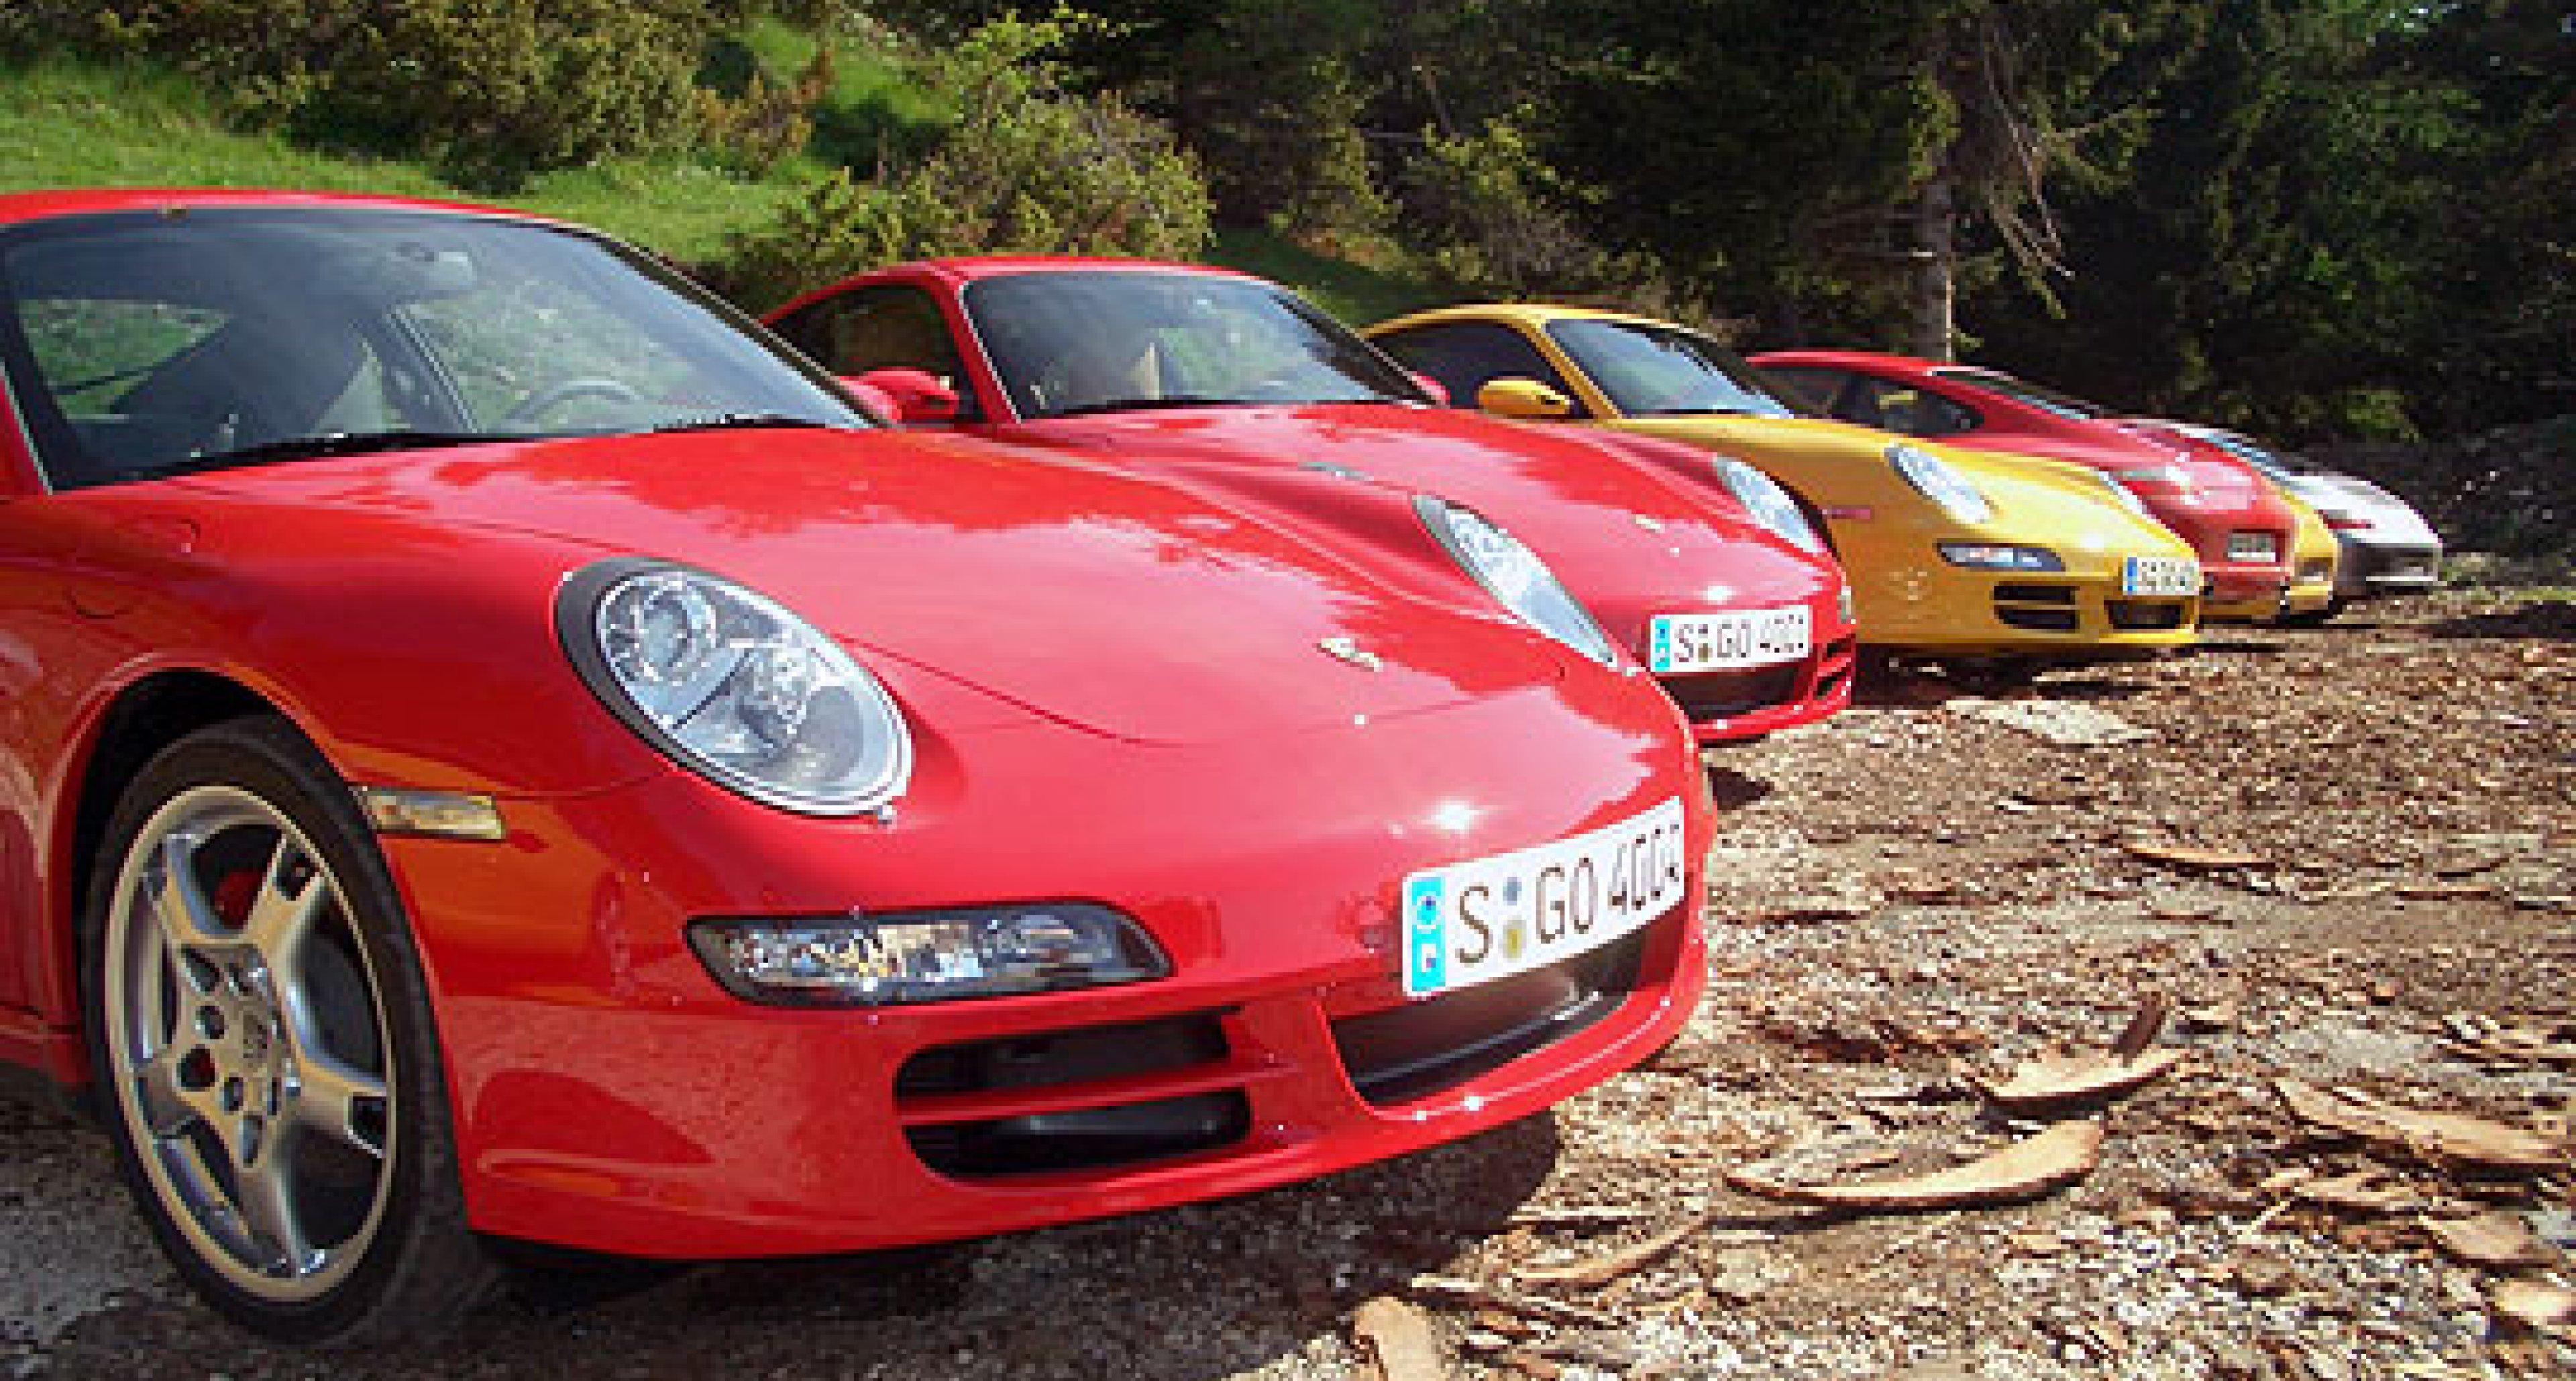 Porsche 911 Carrera 4S (996)